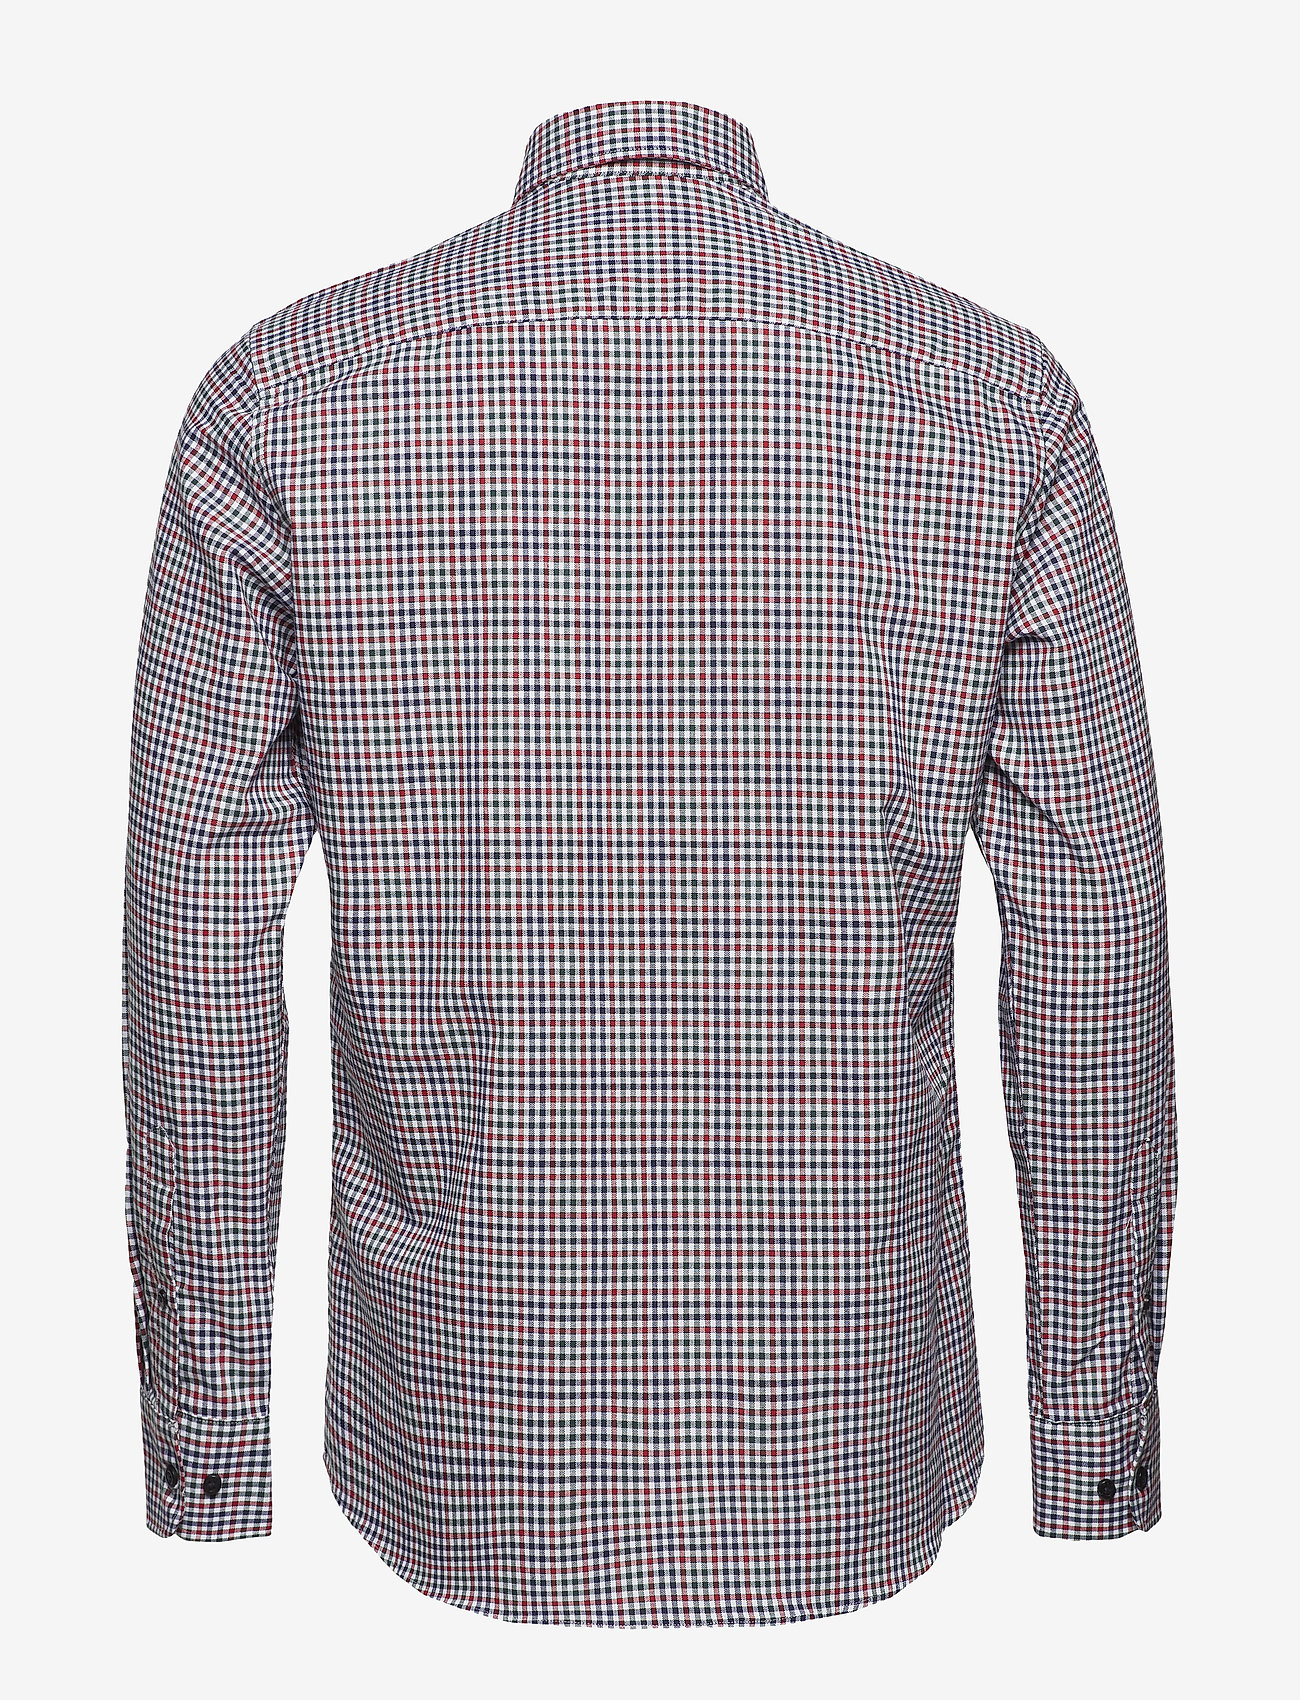 Park Laneshirt L/s - Hemden